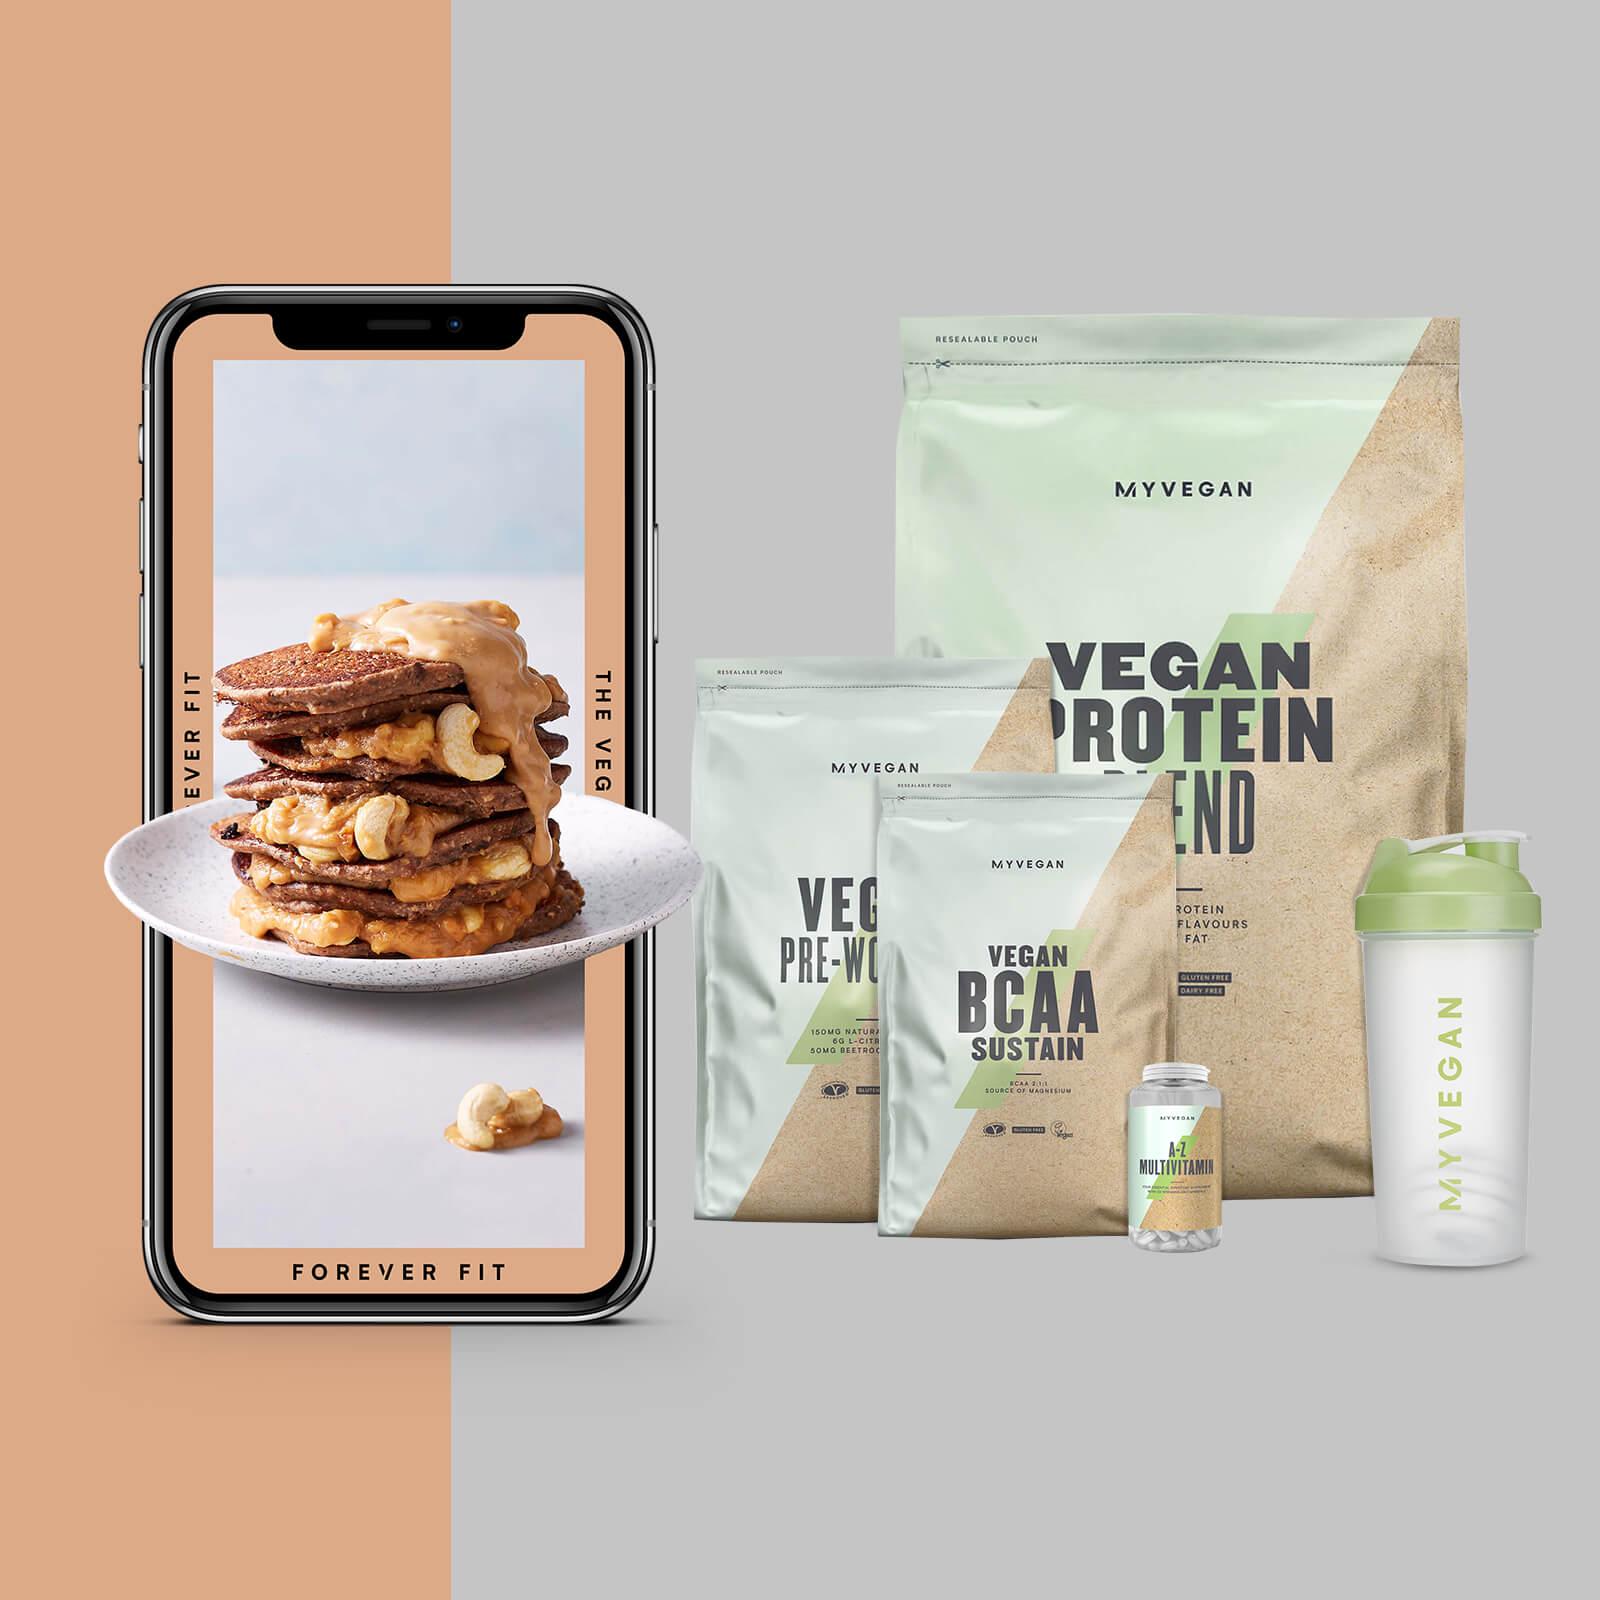 Le Pack Vegan + Guide Entraînement et Nutrition Offert - Lemon and Lime - Lemon Tea - Coffee and Walnut